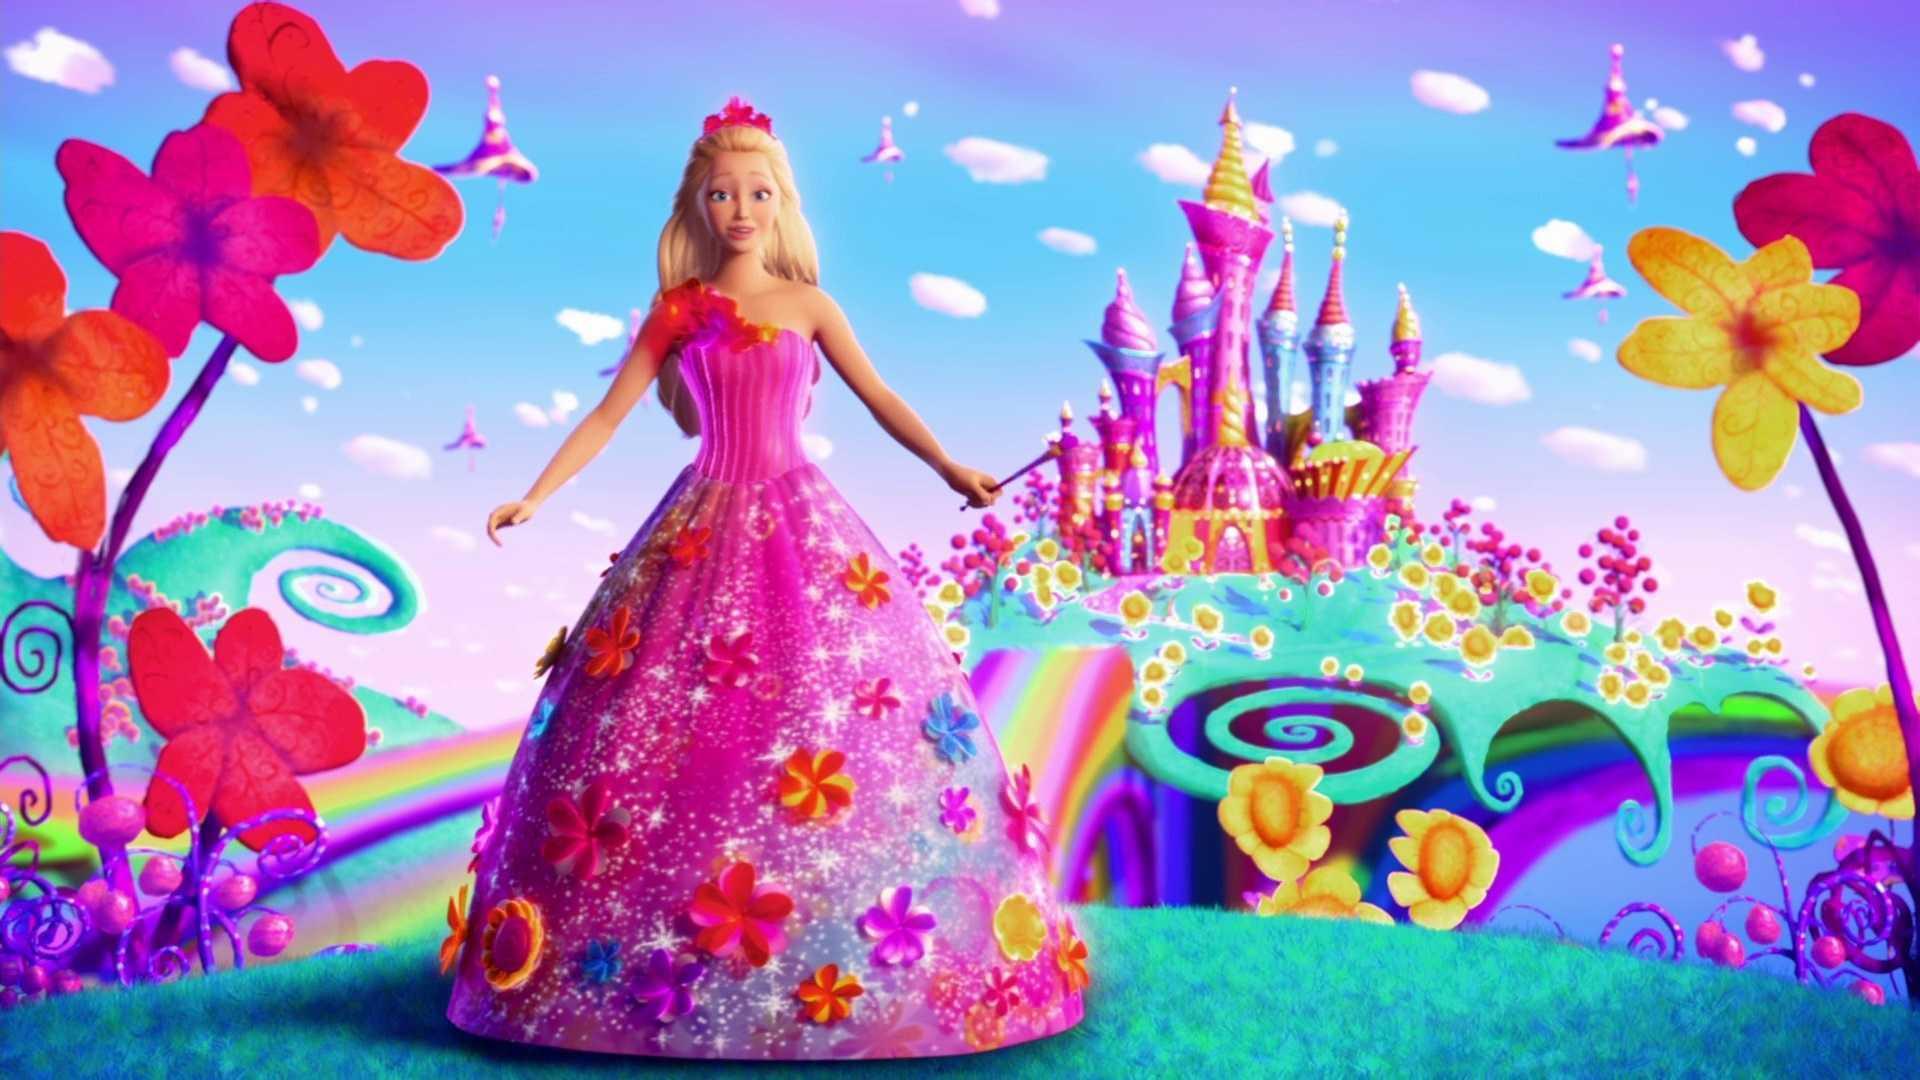 Barbie clipart background WallpaperSafari Desktop Wallpapers 2015new 2015